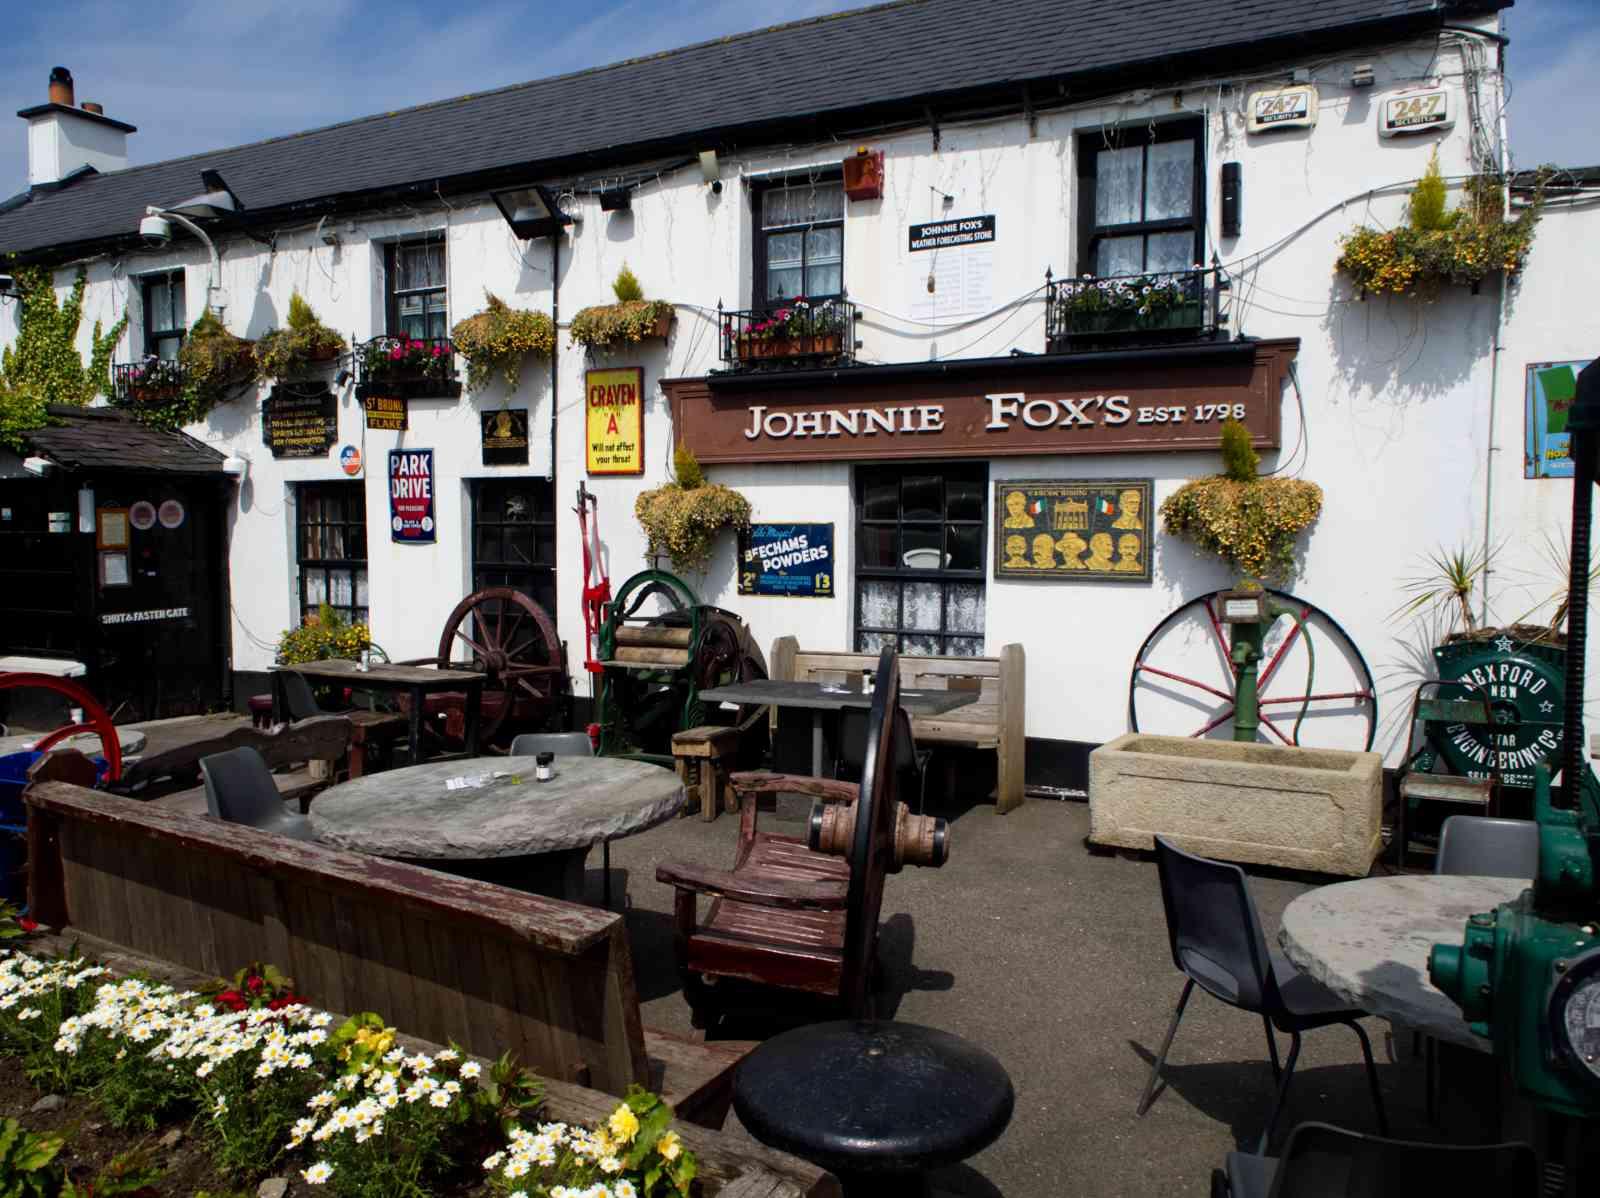 Prince William's Seat - Johnnie Fox's Pub